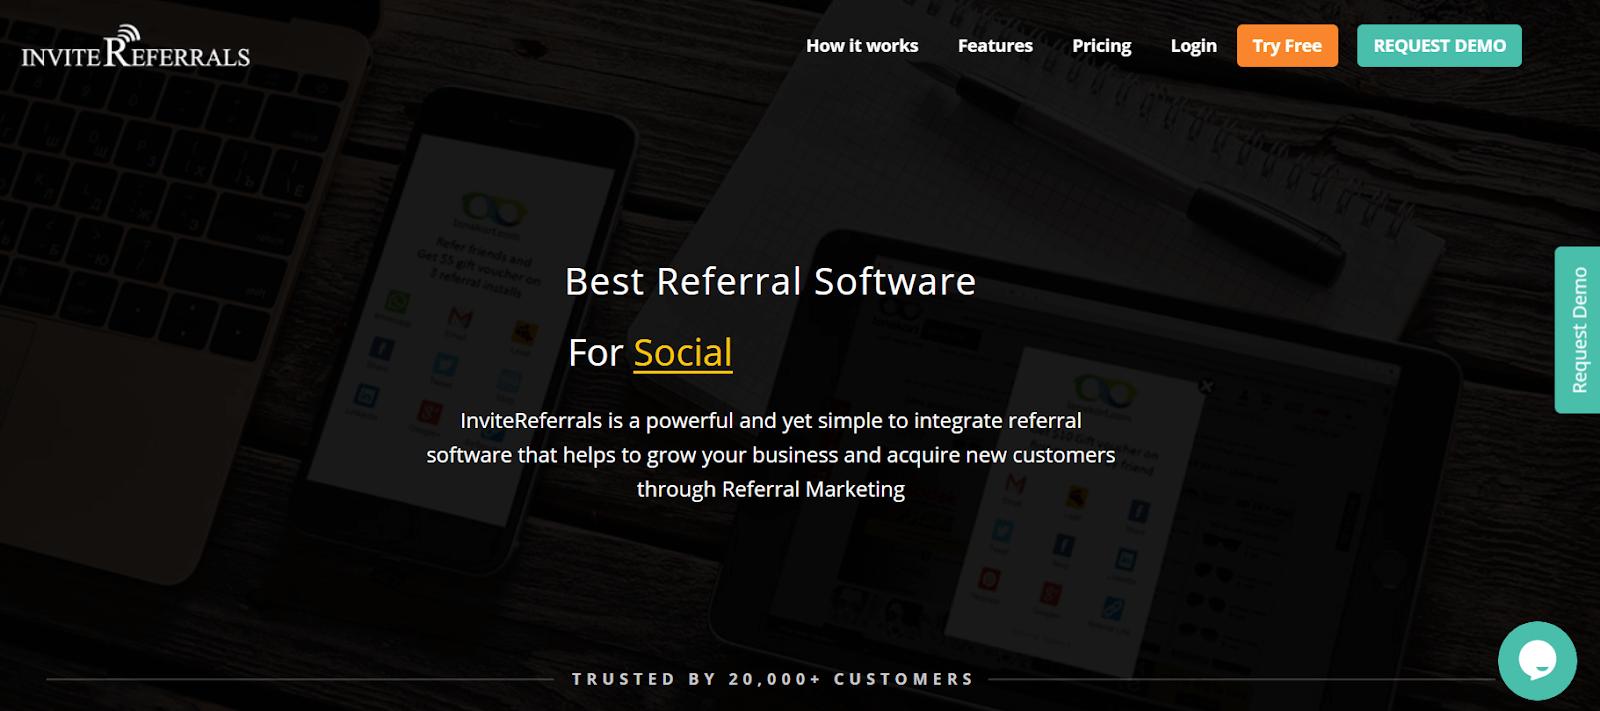 InviteReferrals Referral Marketing Software Tool